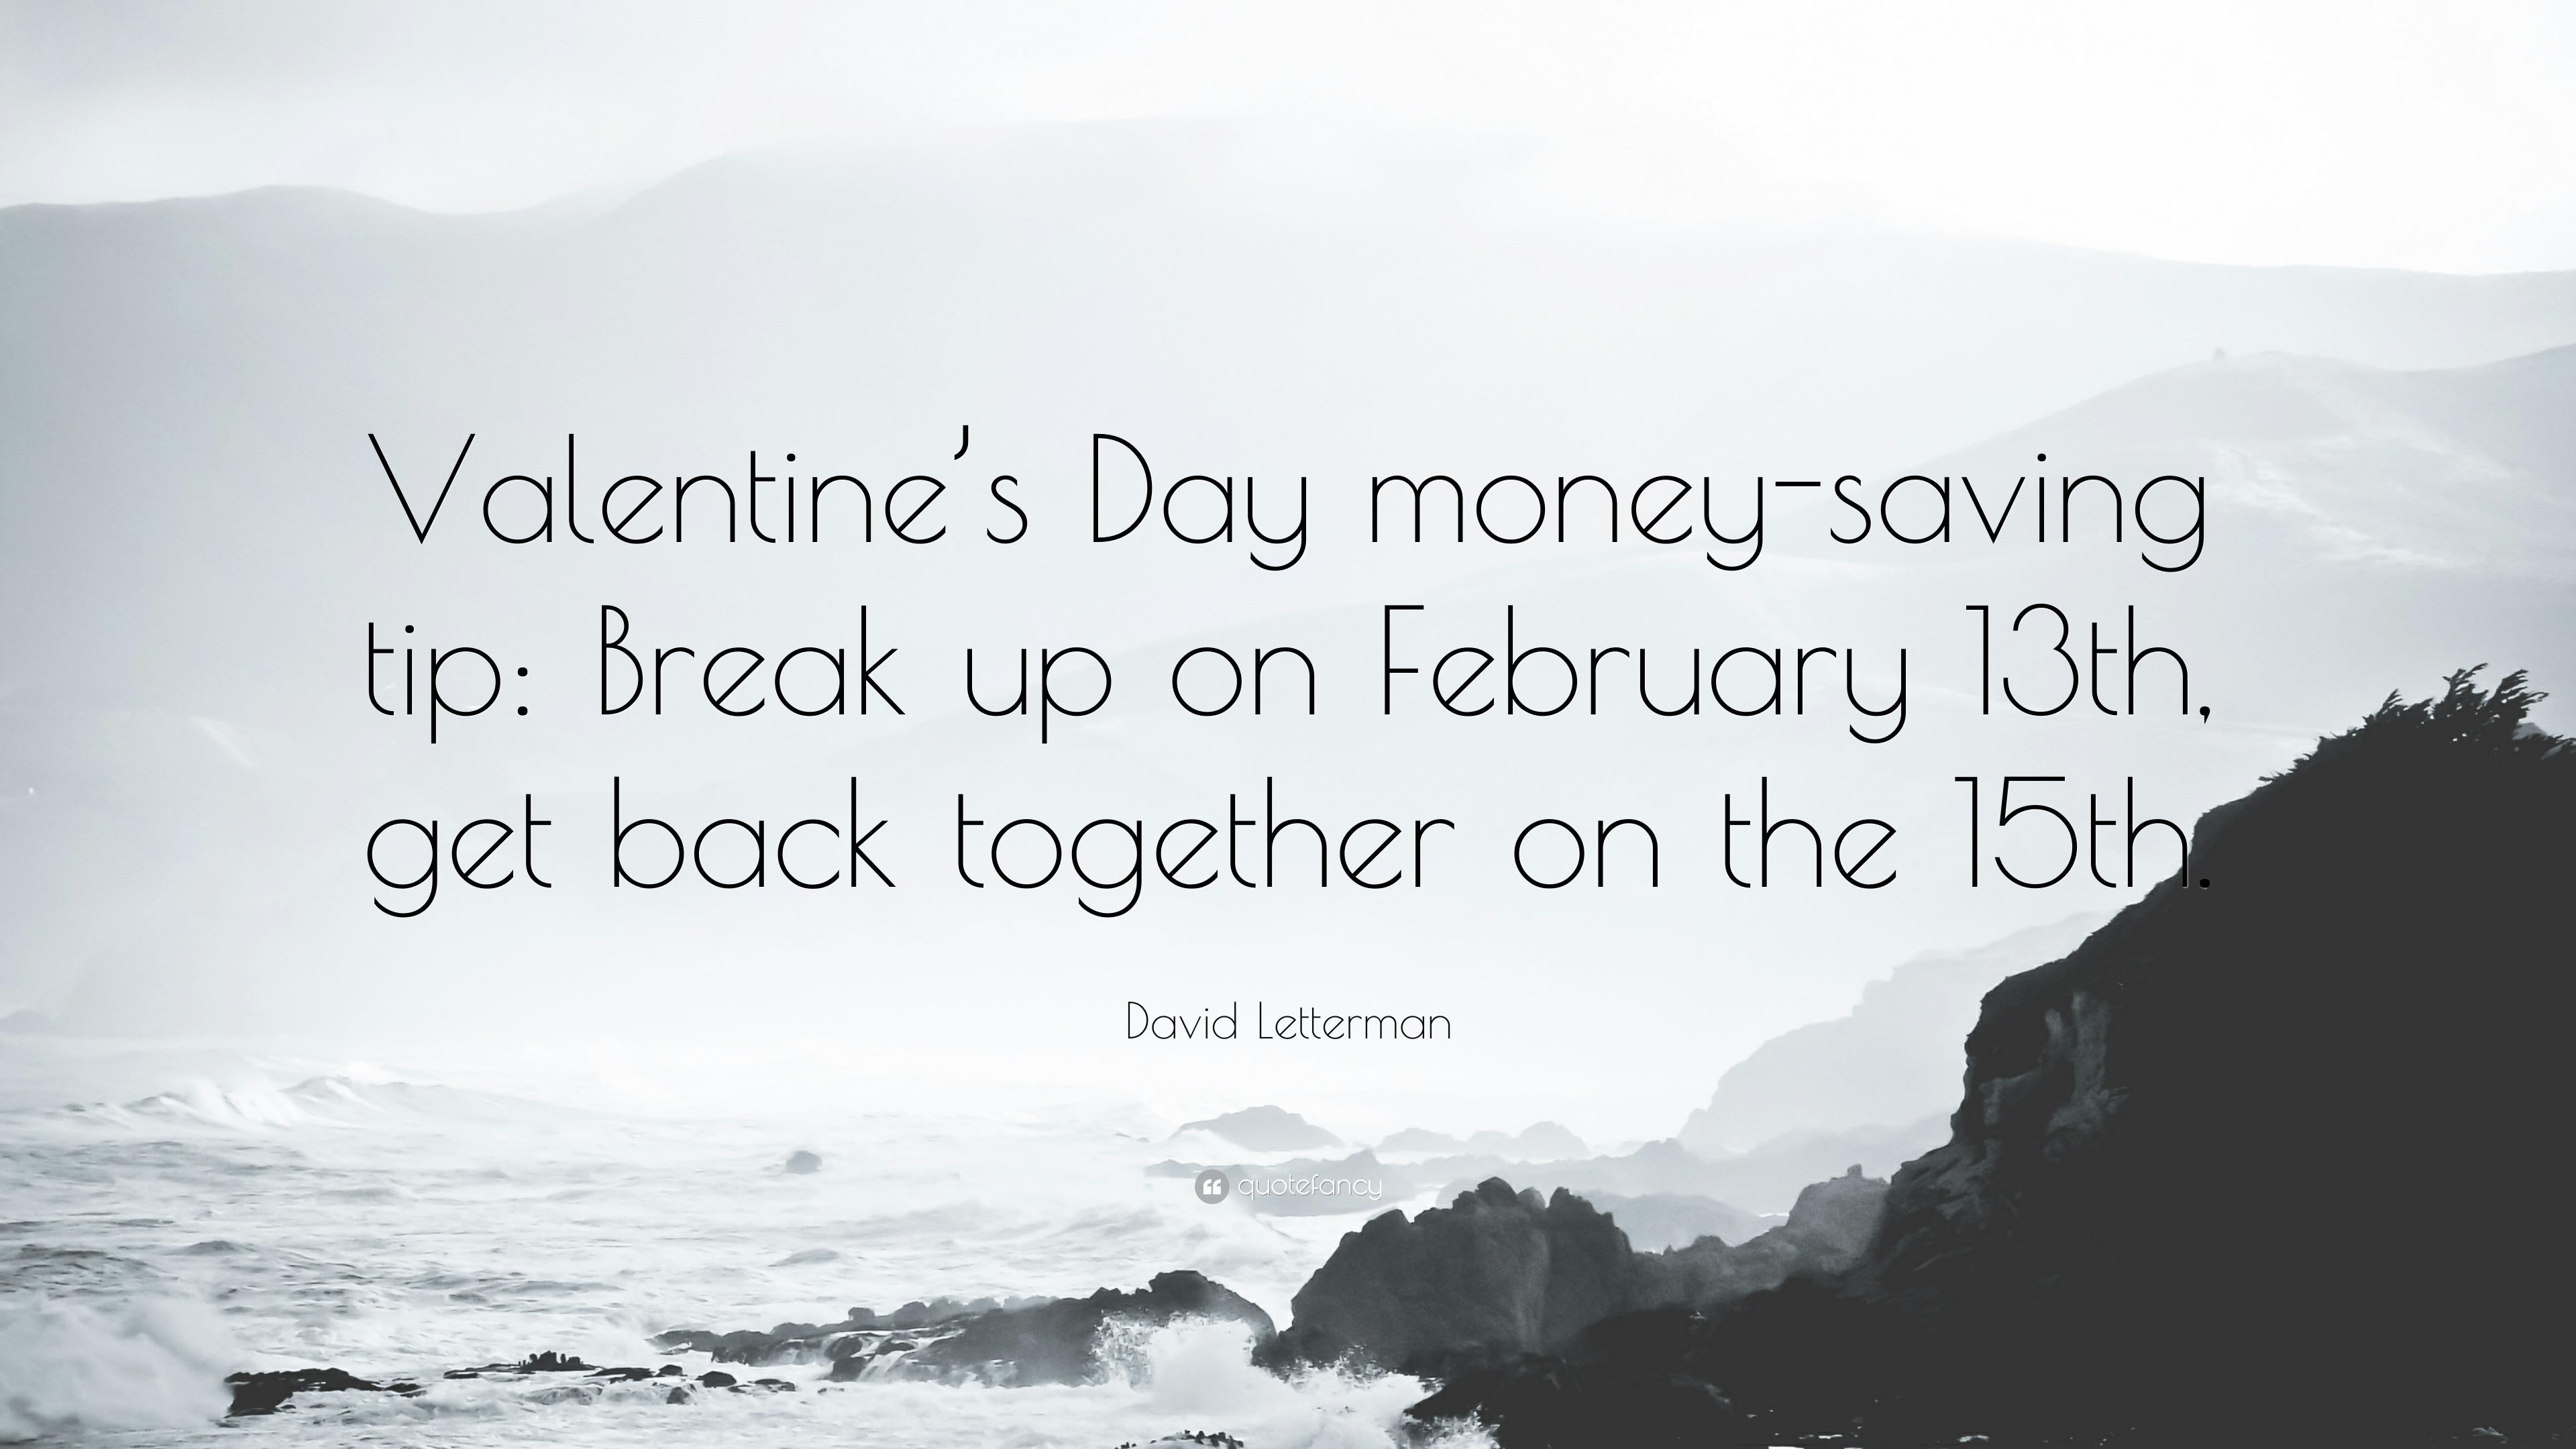 David Letterman Quote Valentines Day Money Saving Tip Break Up